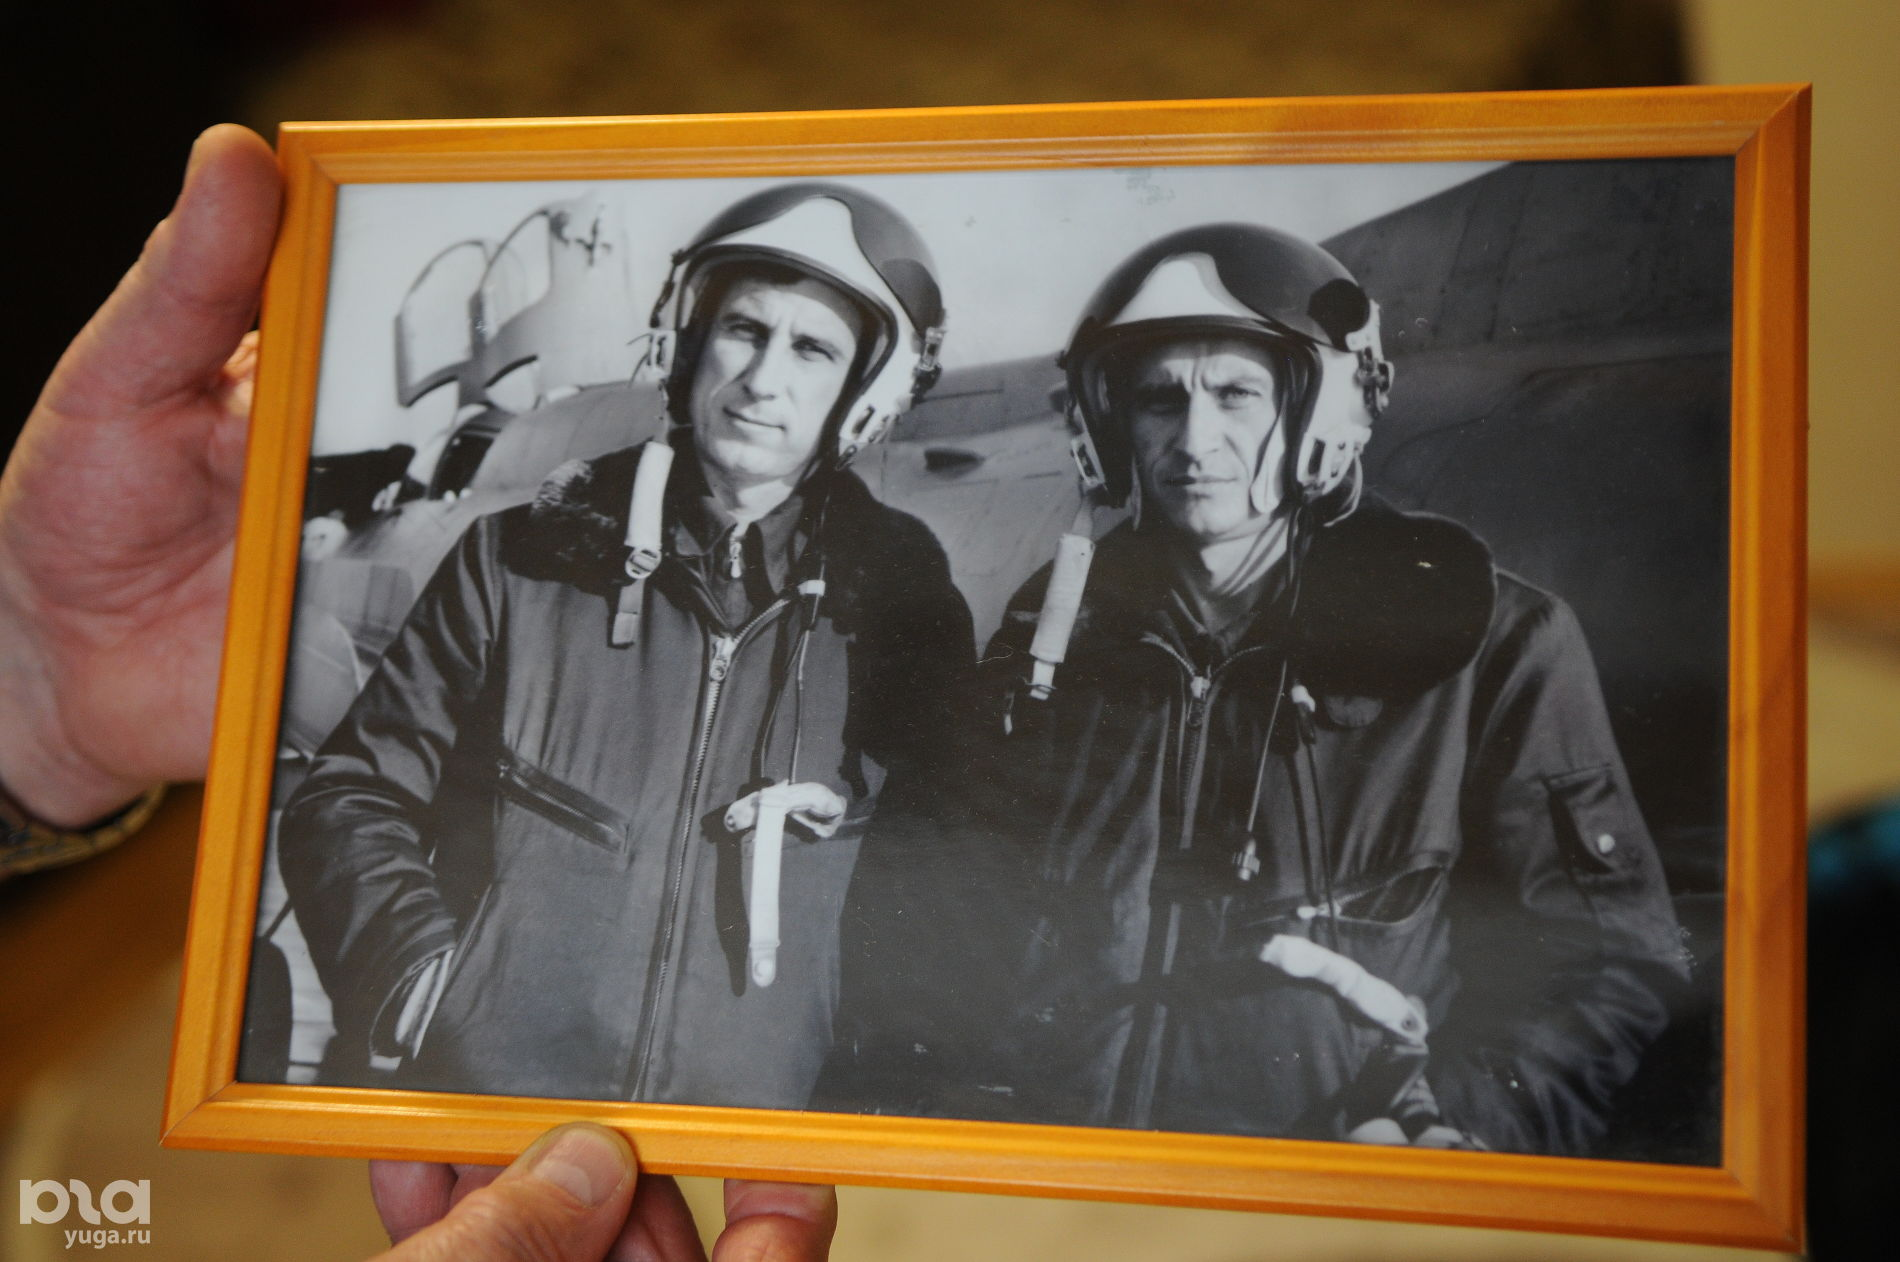 Николай Адонин (слева) с сослуживцем ©Фото Юга.ру